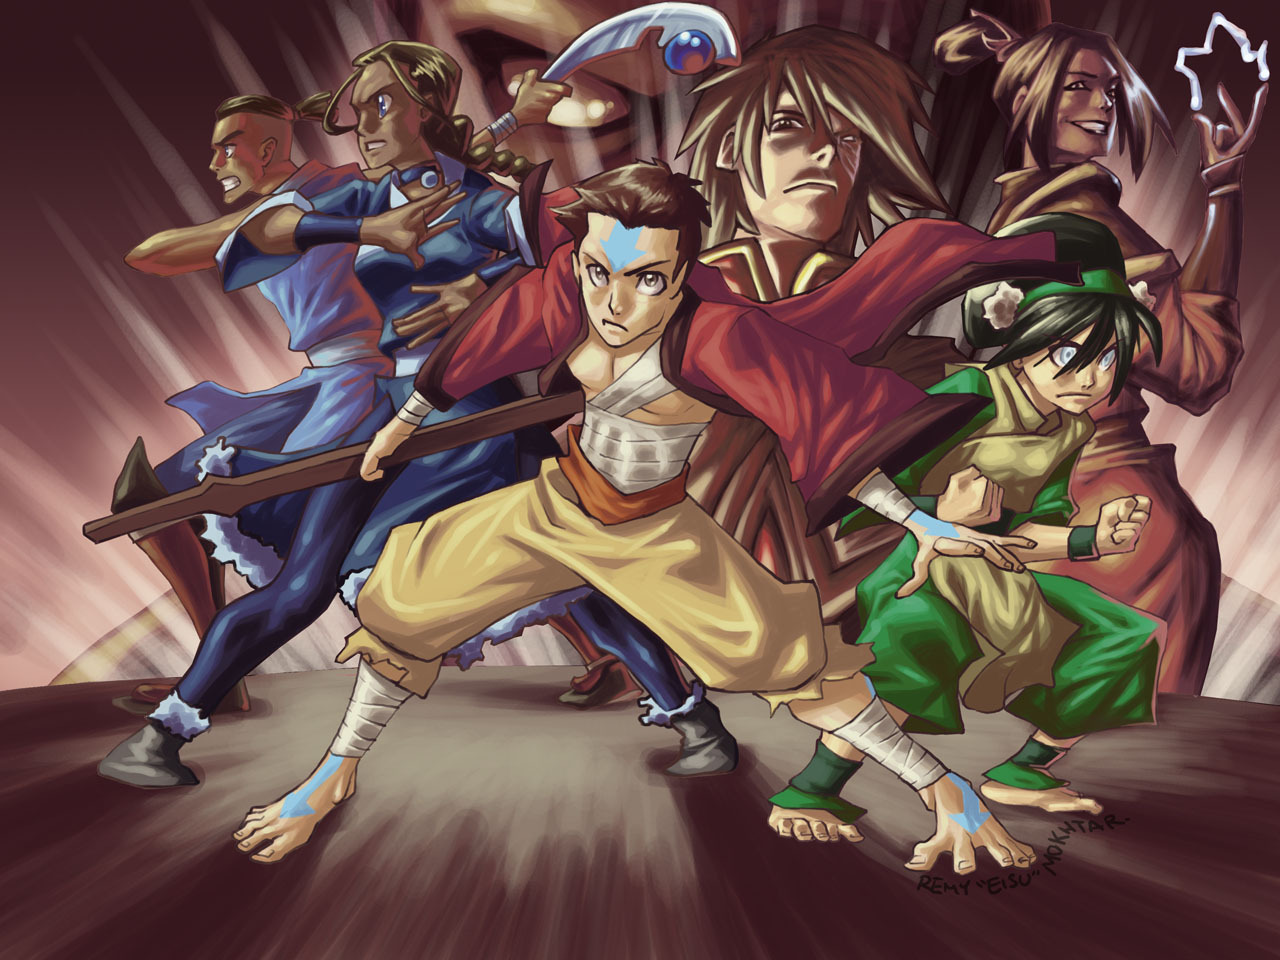 Anime   Avatar The Last Airbender Wallpaper 1280x960